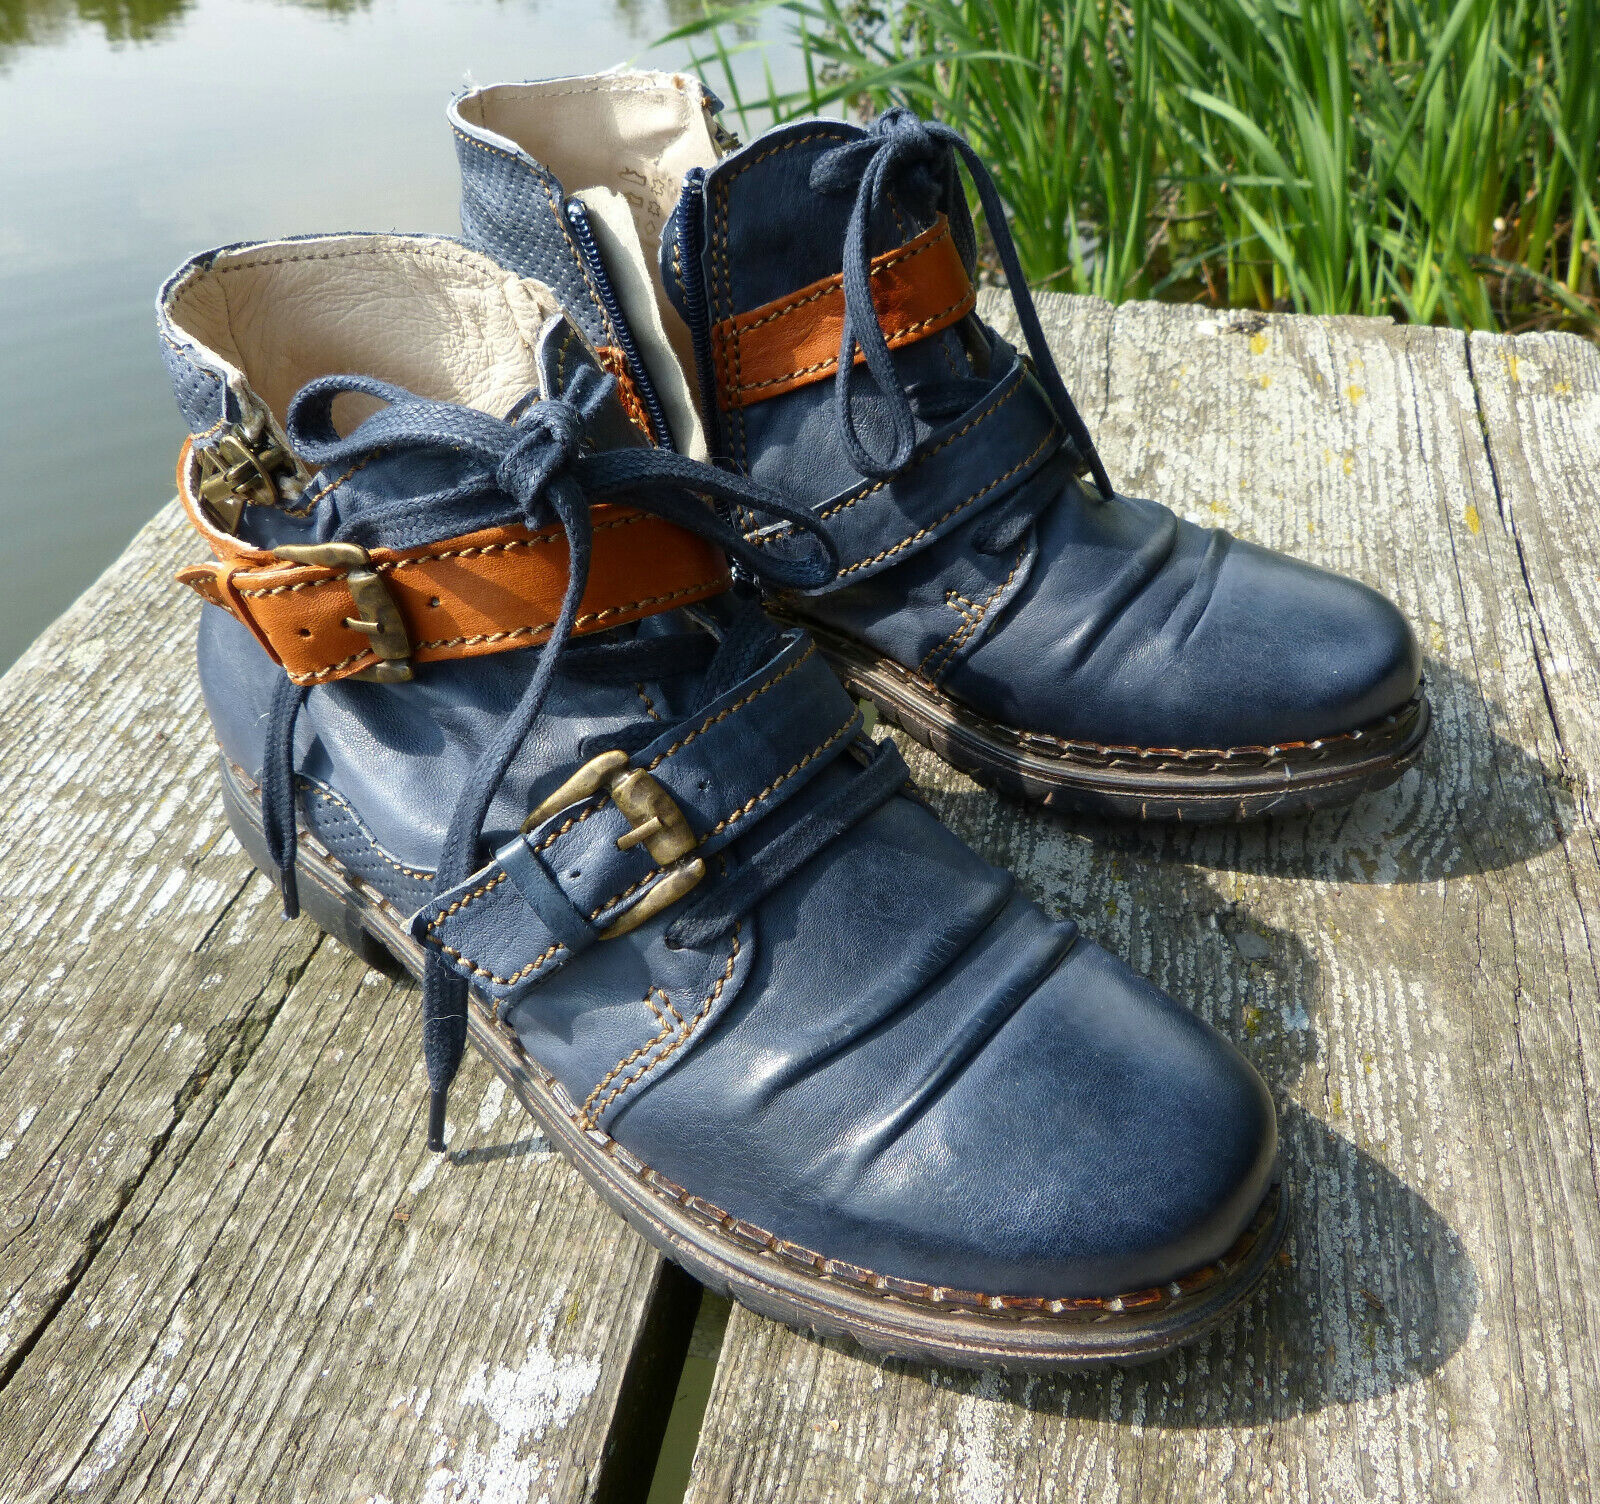 Rovers Stiefelette Halbschuh Gr. 38 blau   jeans Stiefel Leder neu